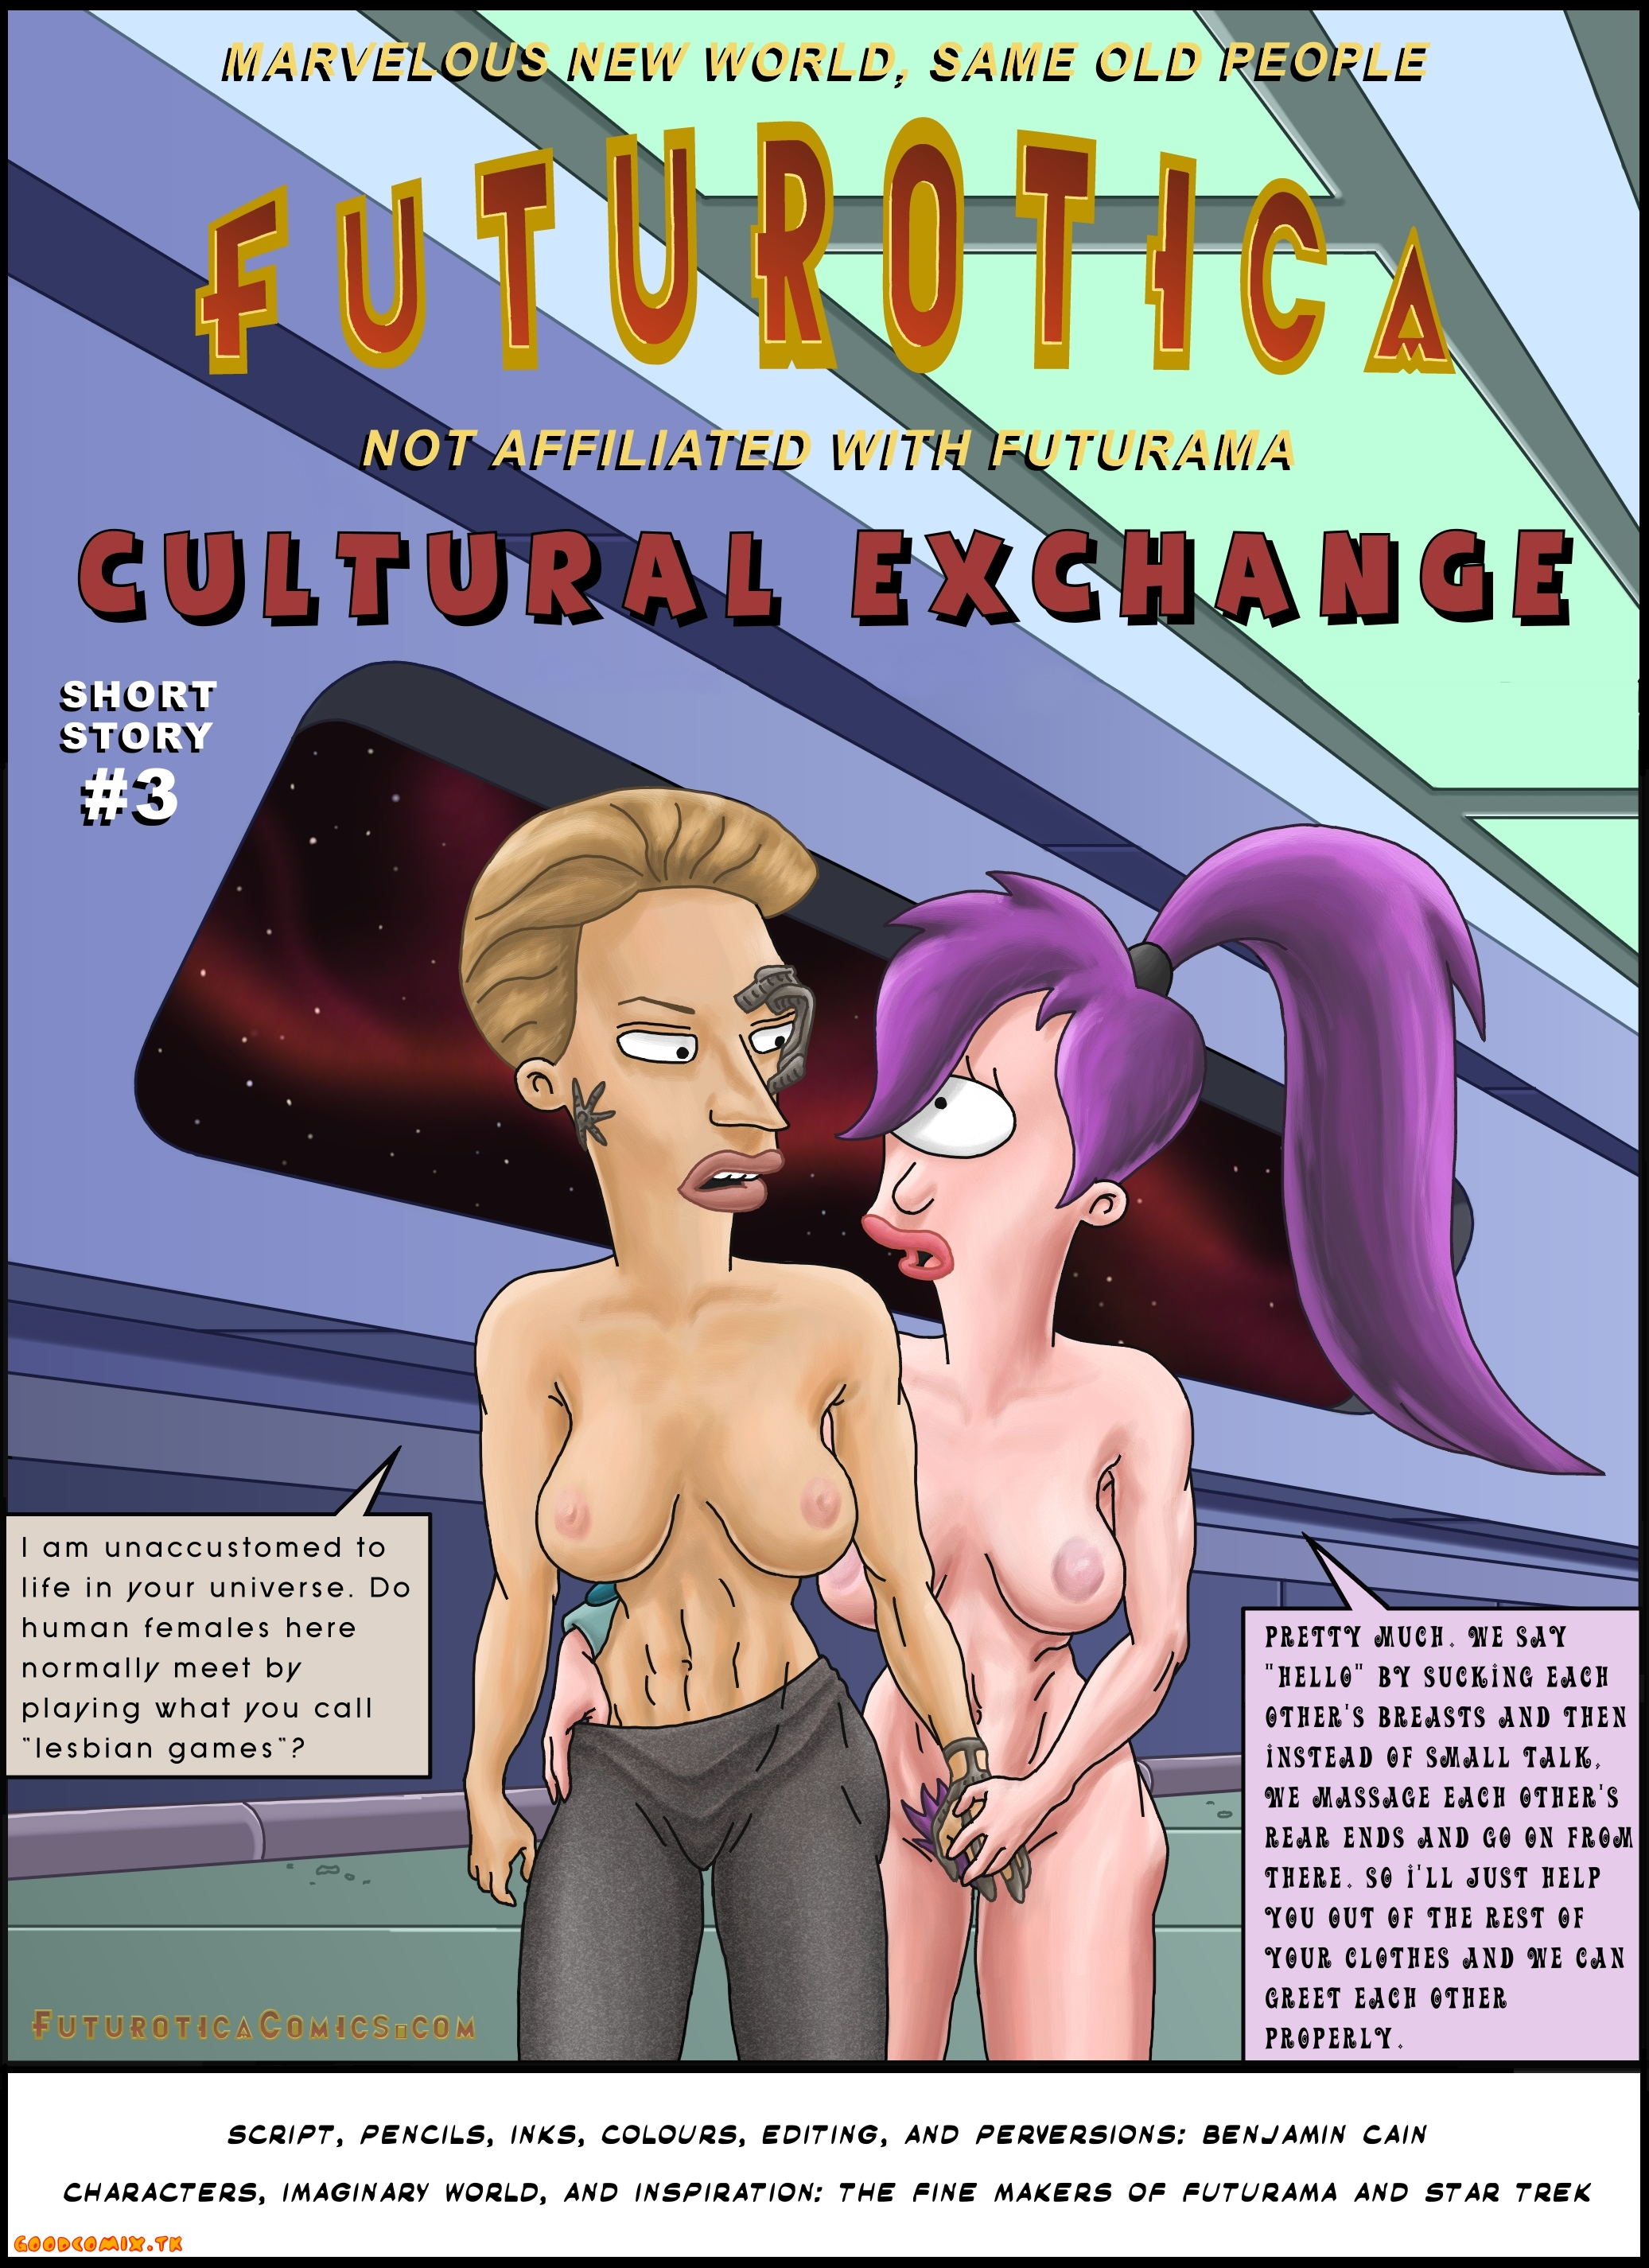 Goodcomix Futurama - Futurotica - Short Story #3 - Cultural Exchange xxx porno